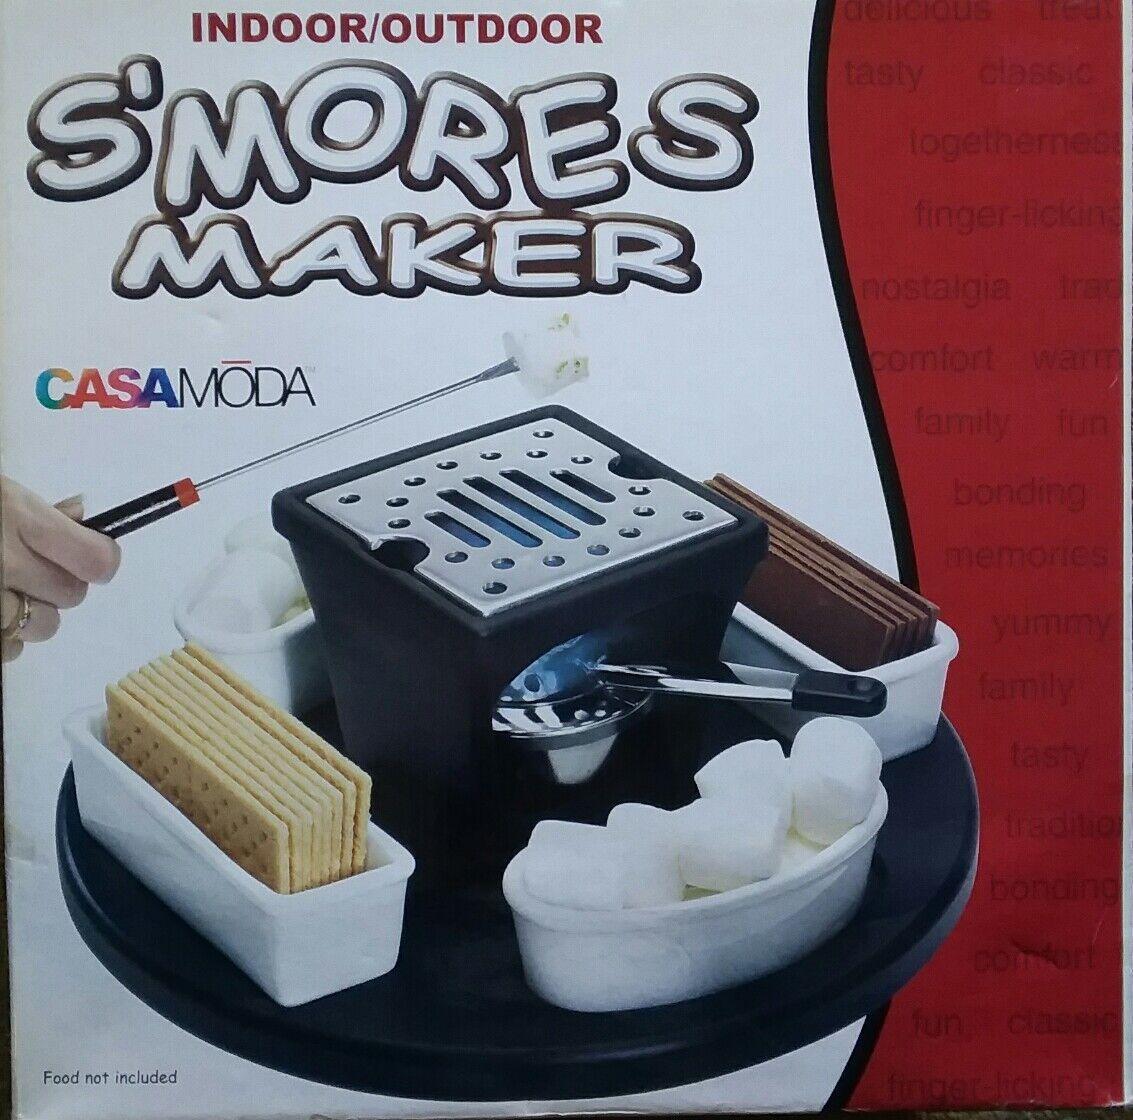 Nouveau CASAMODA Indoor Outdoor Guimauve Maker No CM10403 non-élu de .4 fourchettes, Manuel